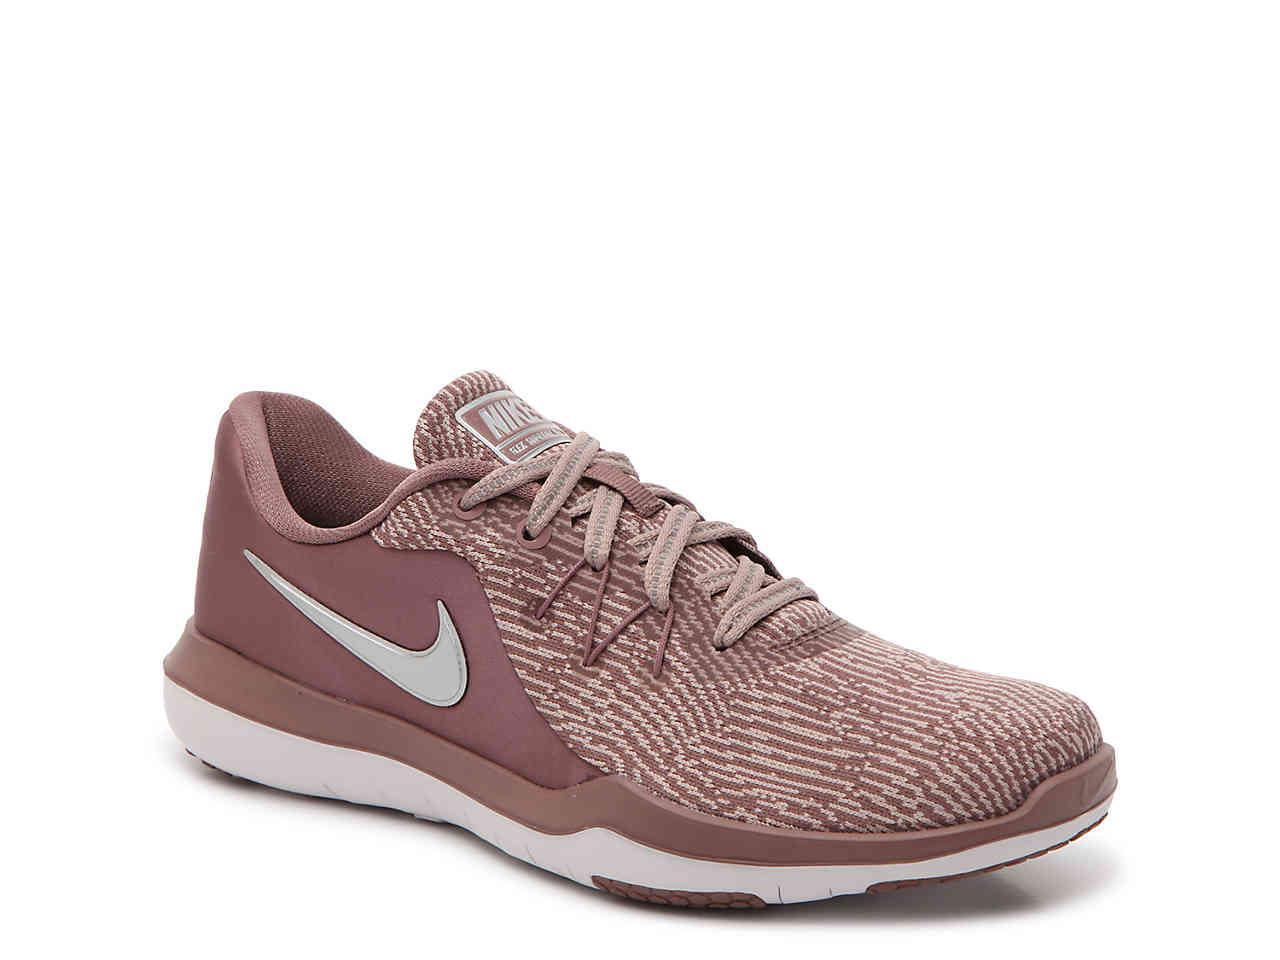 80308852a5c49 ... dsw 6ad13 1b4bb store lyst nike flex superior tr 8 lightweight training  shoe in pink 5b38e 03e86 ...